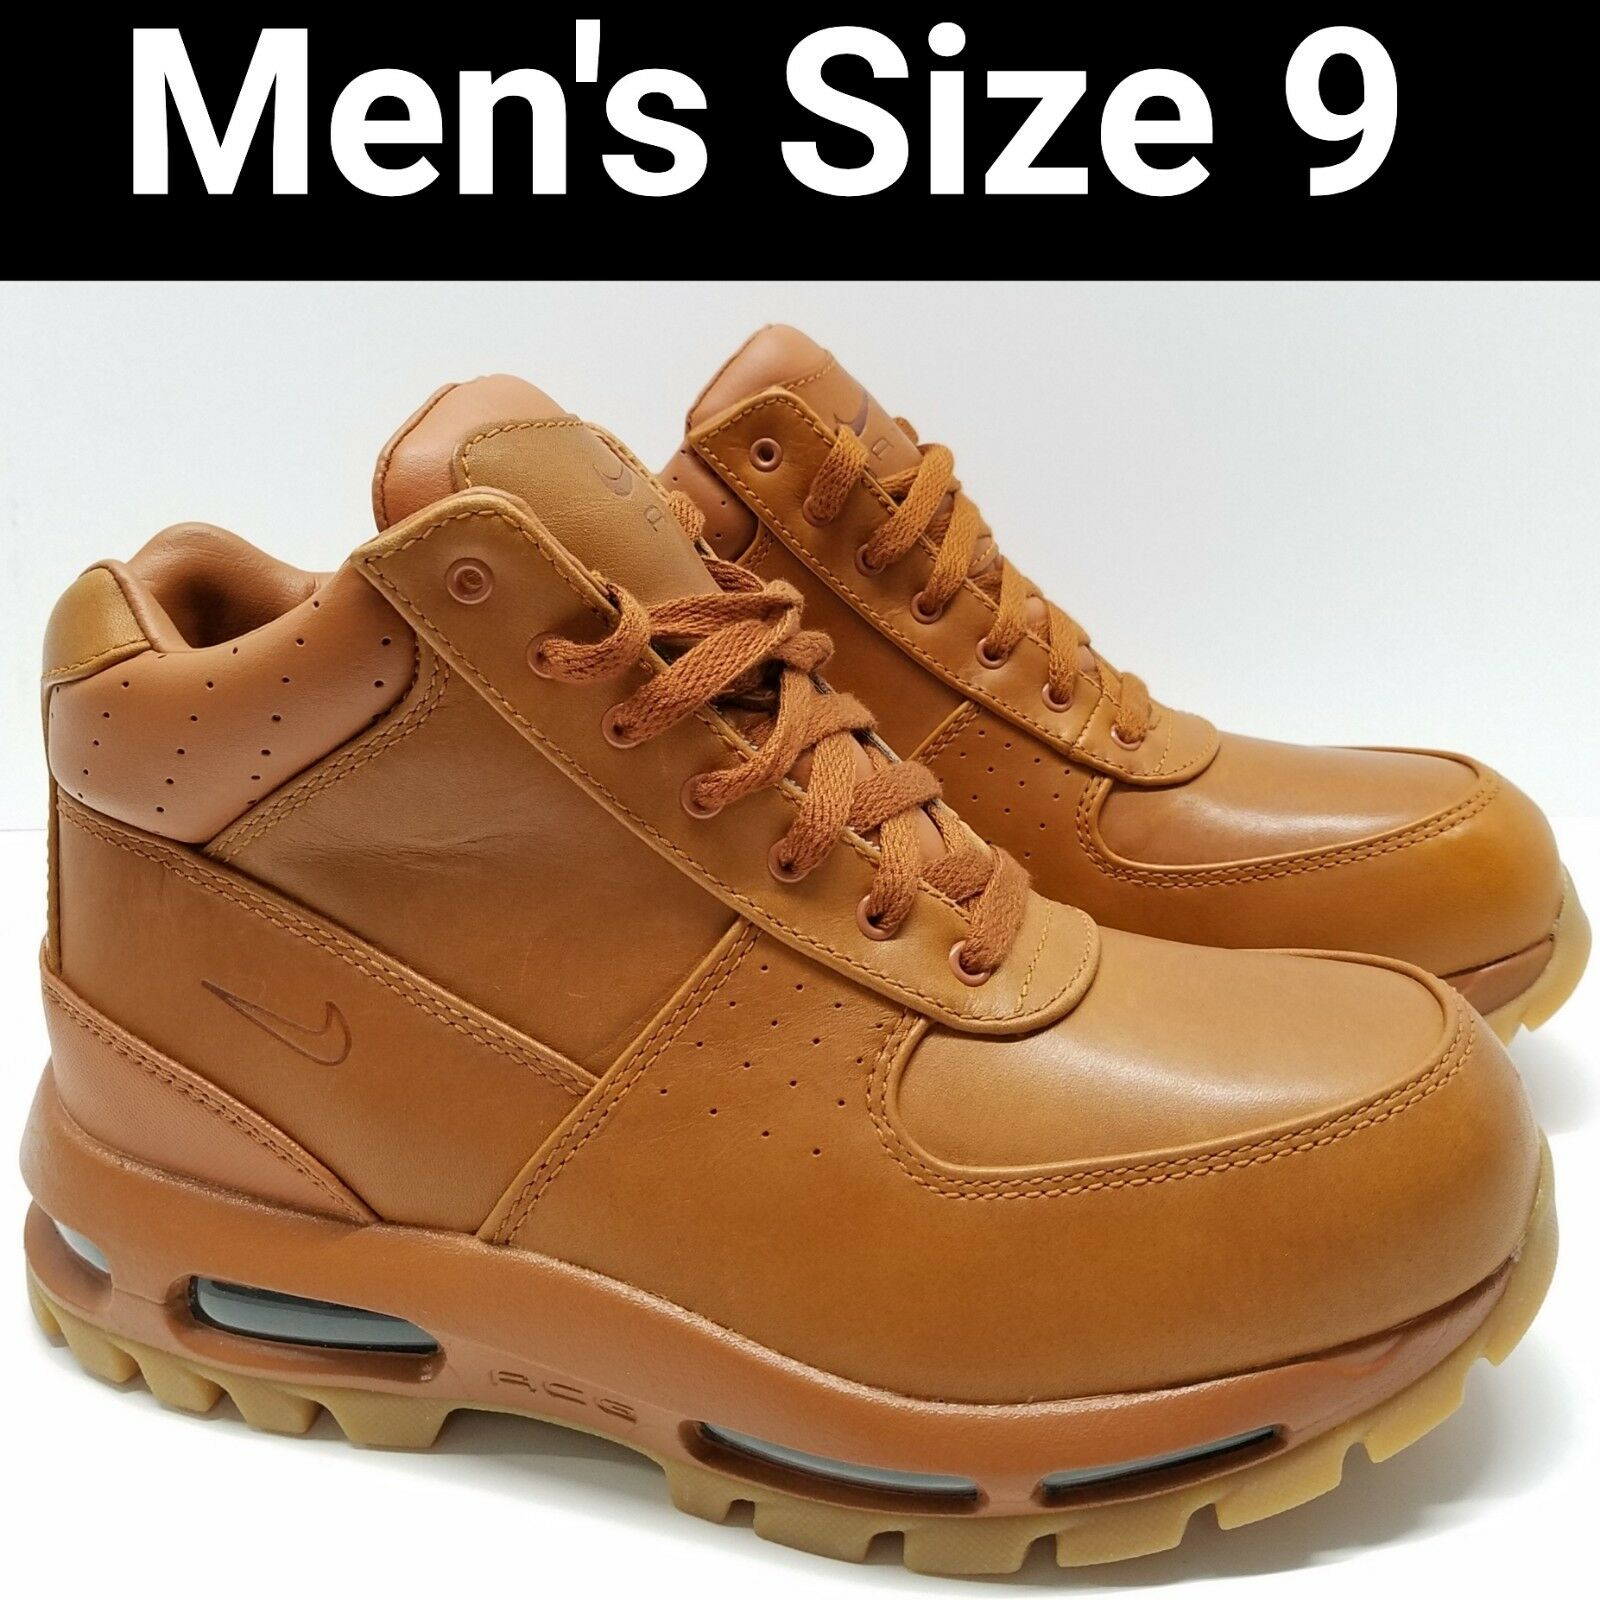 0dd34cb90d Nike Air Max Goadome BOOTS -tawny/gum Light Brown -865031 208 Mens Sz 9